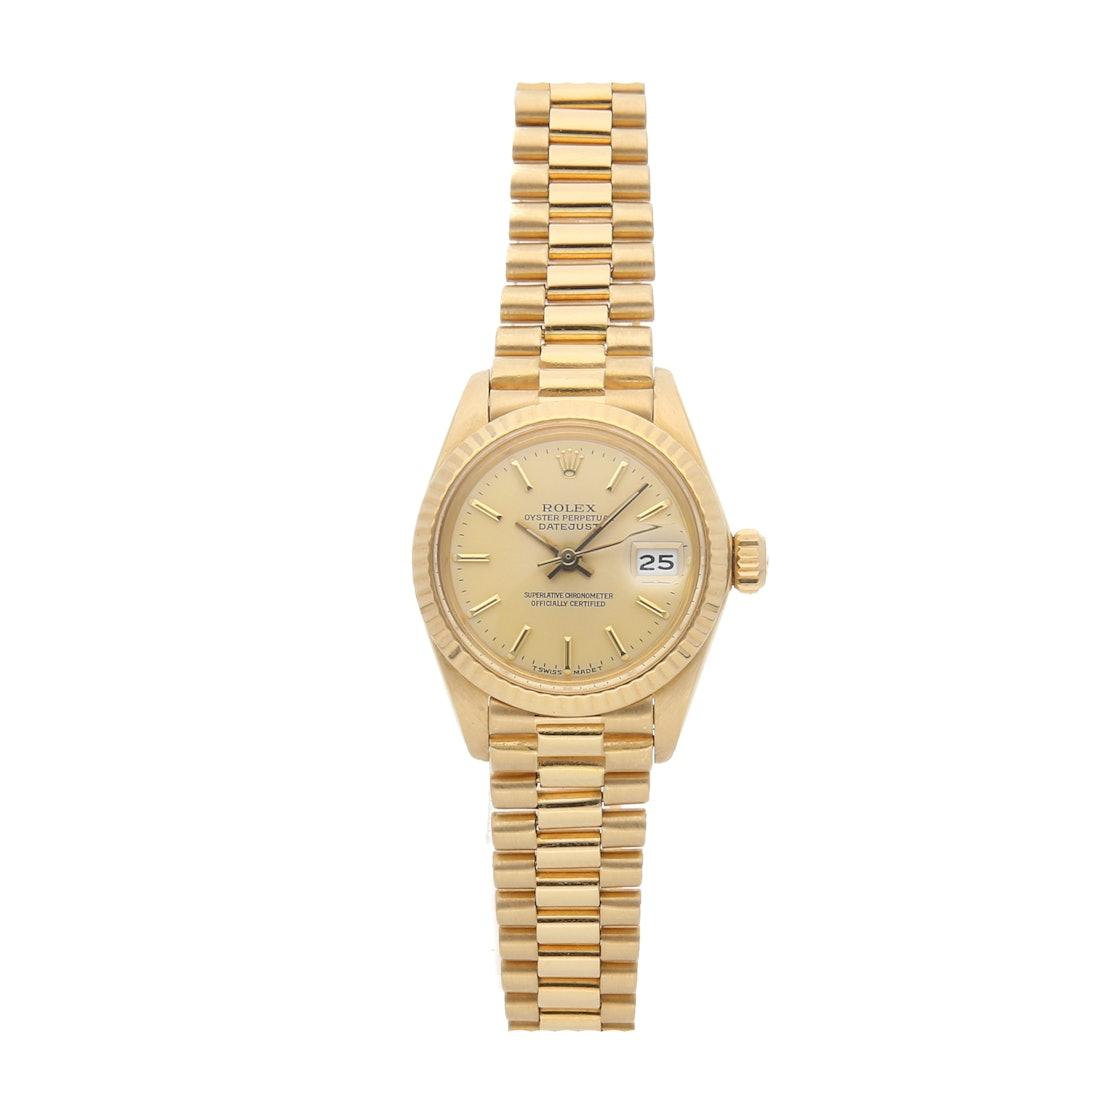 Rolex Datejust 6917/8